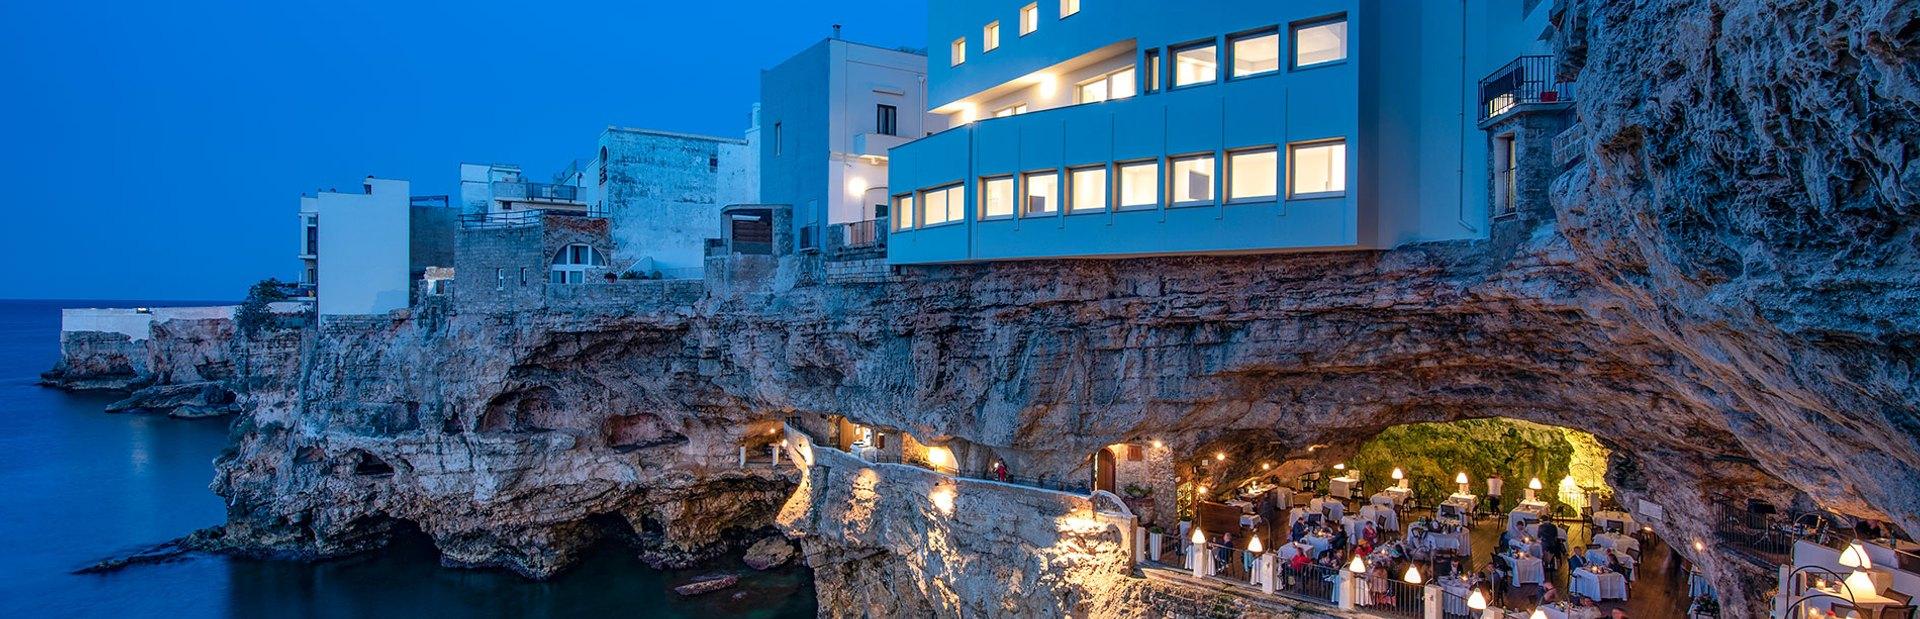 Grotta Palazzese Image 1